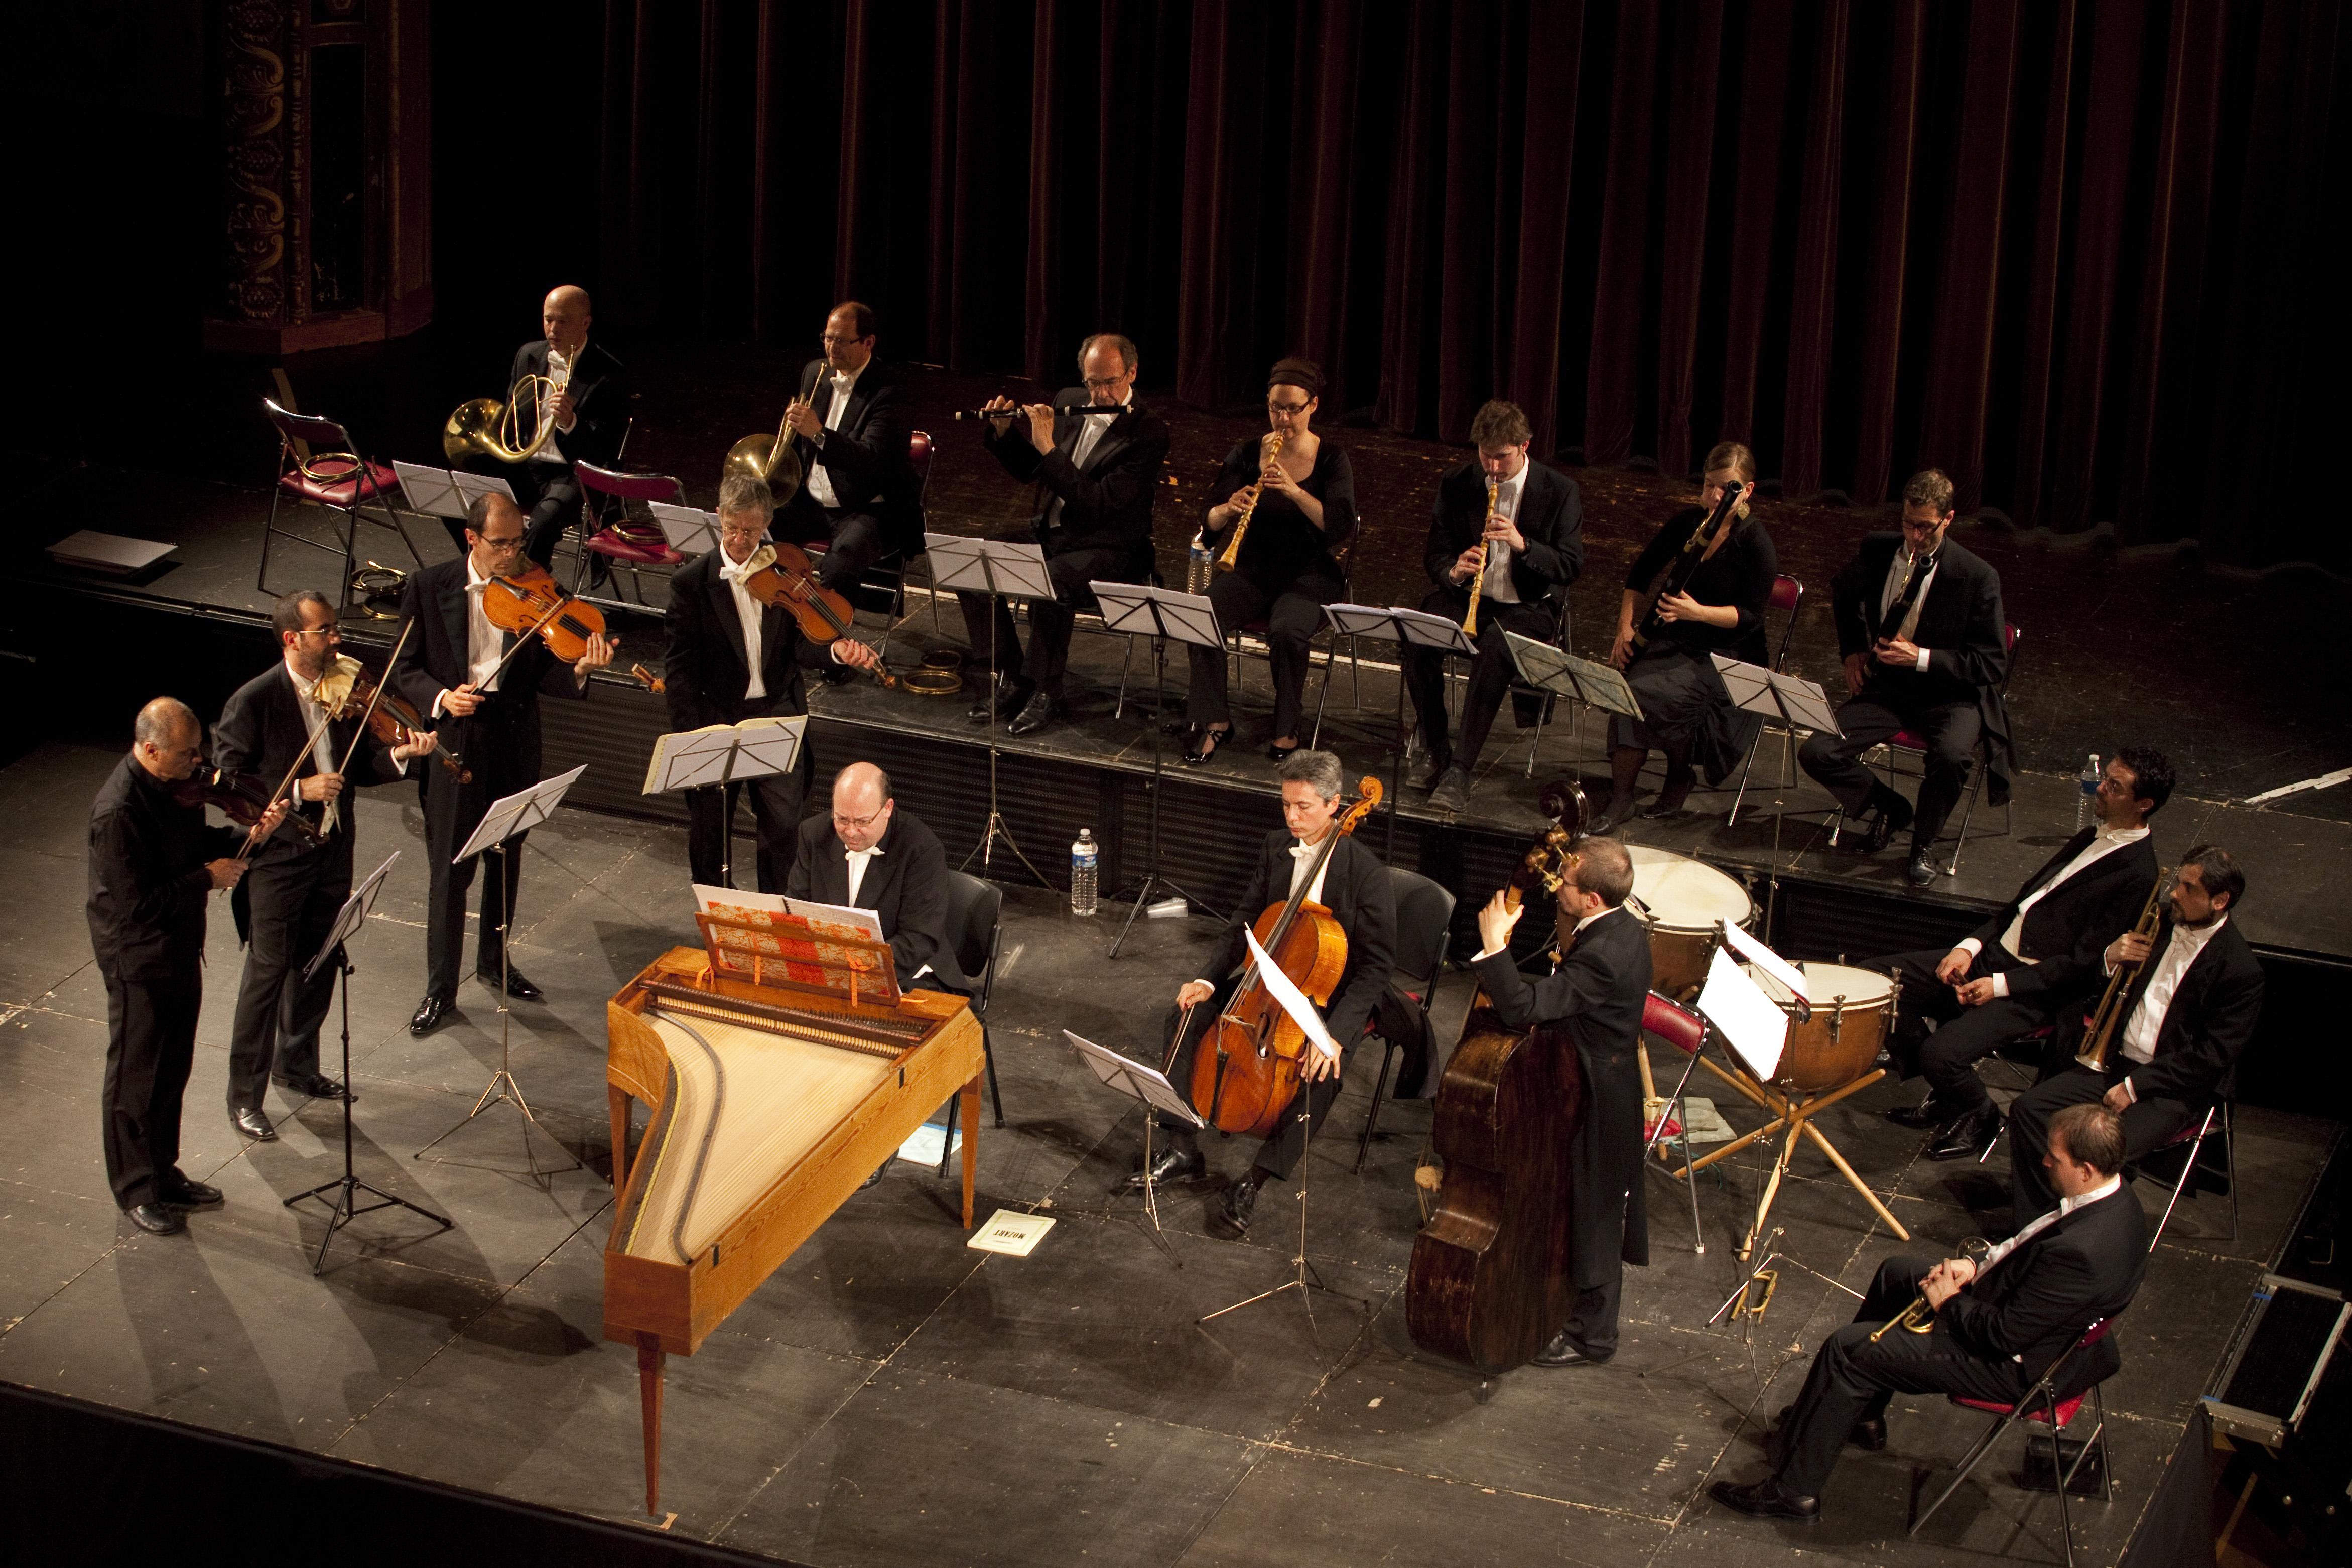 Ensemble Cristofori – 4e Accueil du Festival de Besançon/Montfaucon